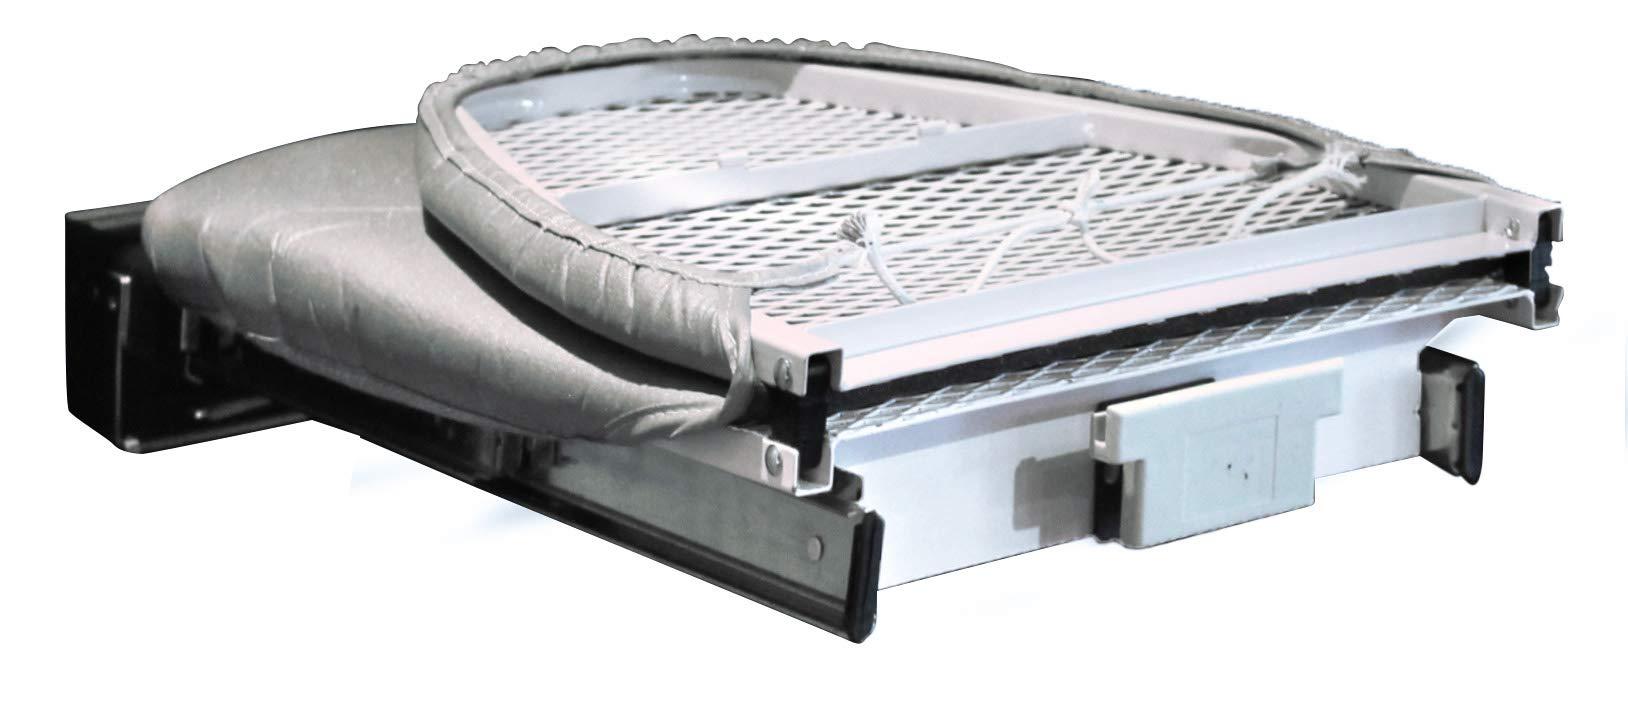 Qline AX AY ABHI 52576 Retractable Ironing Board